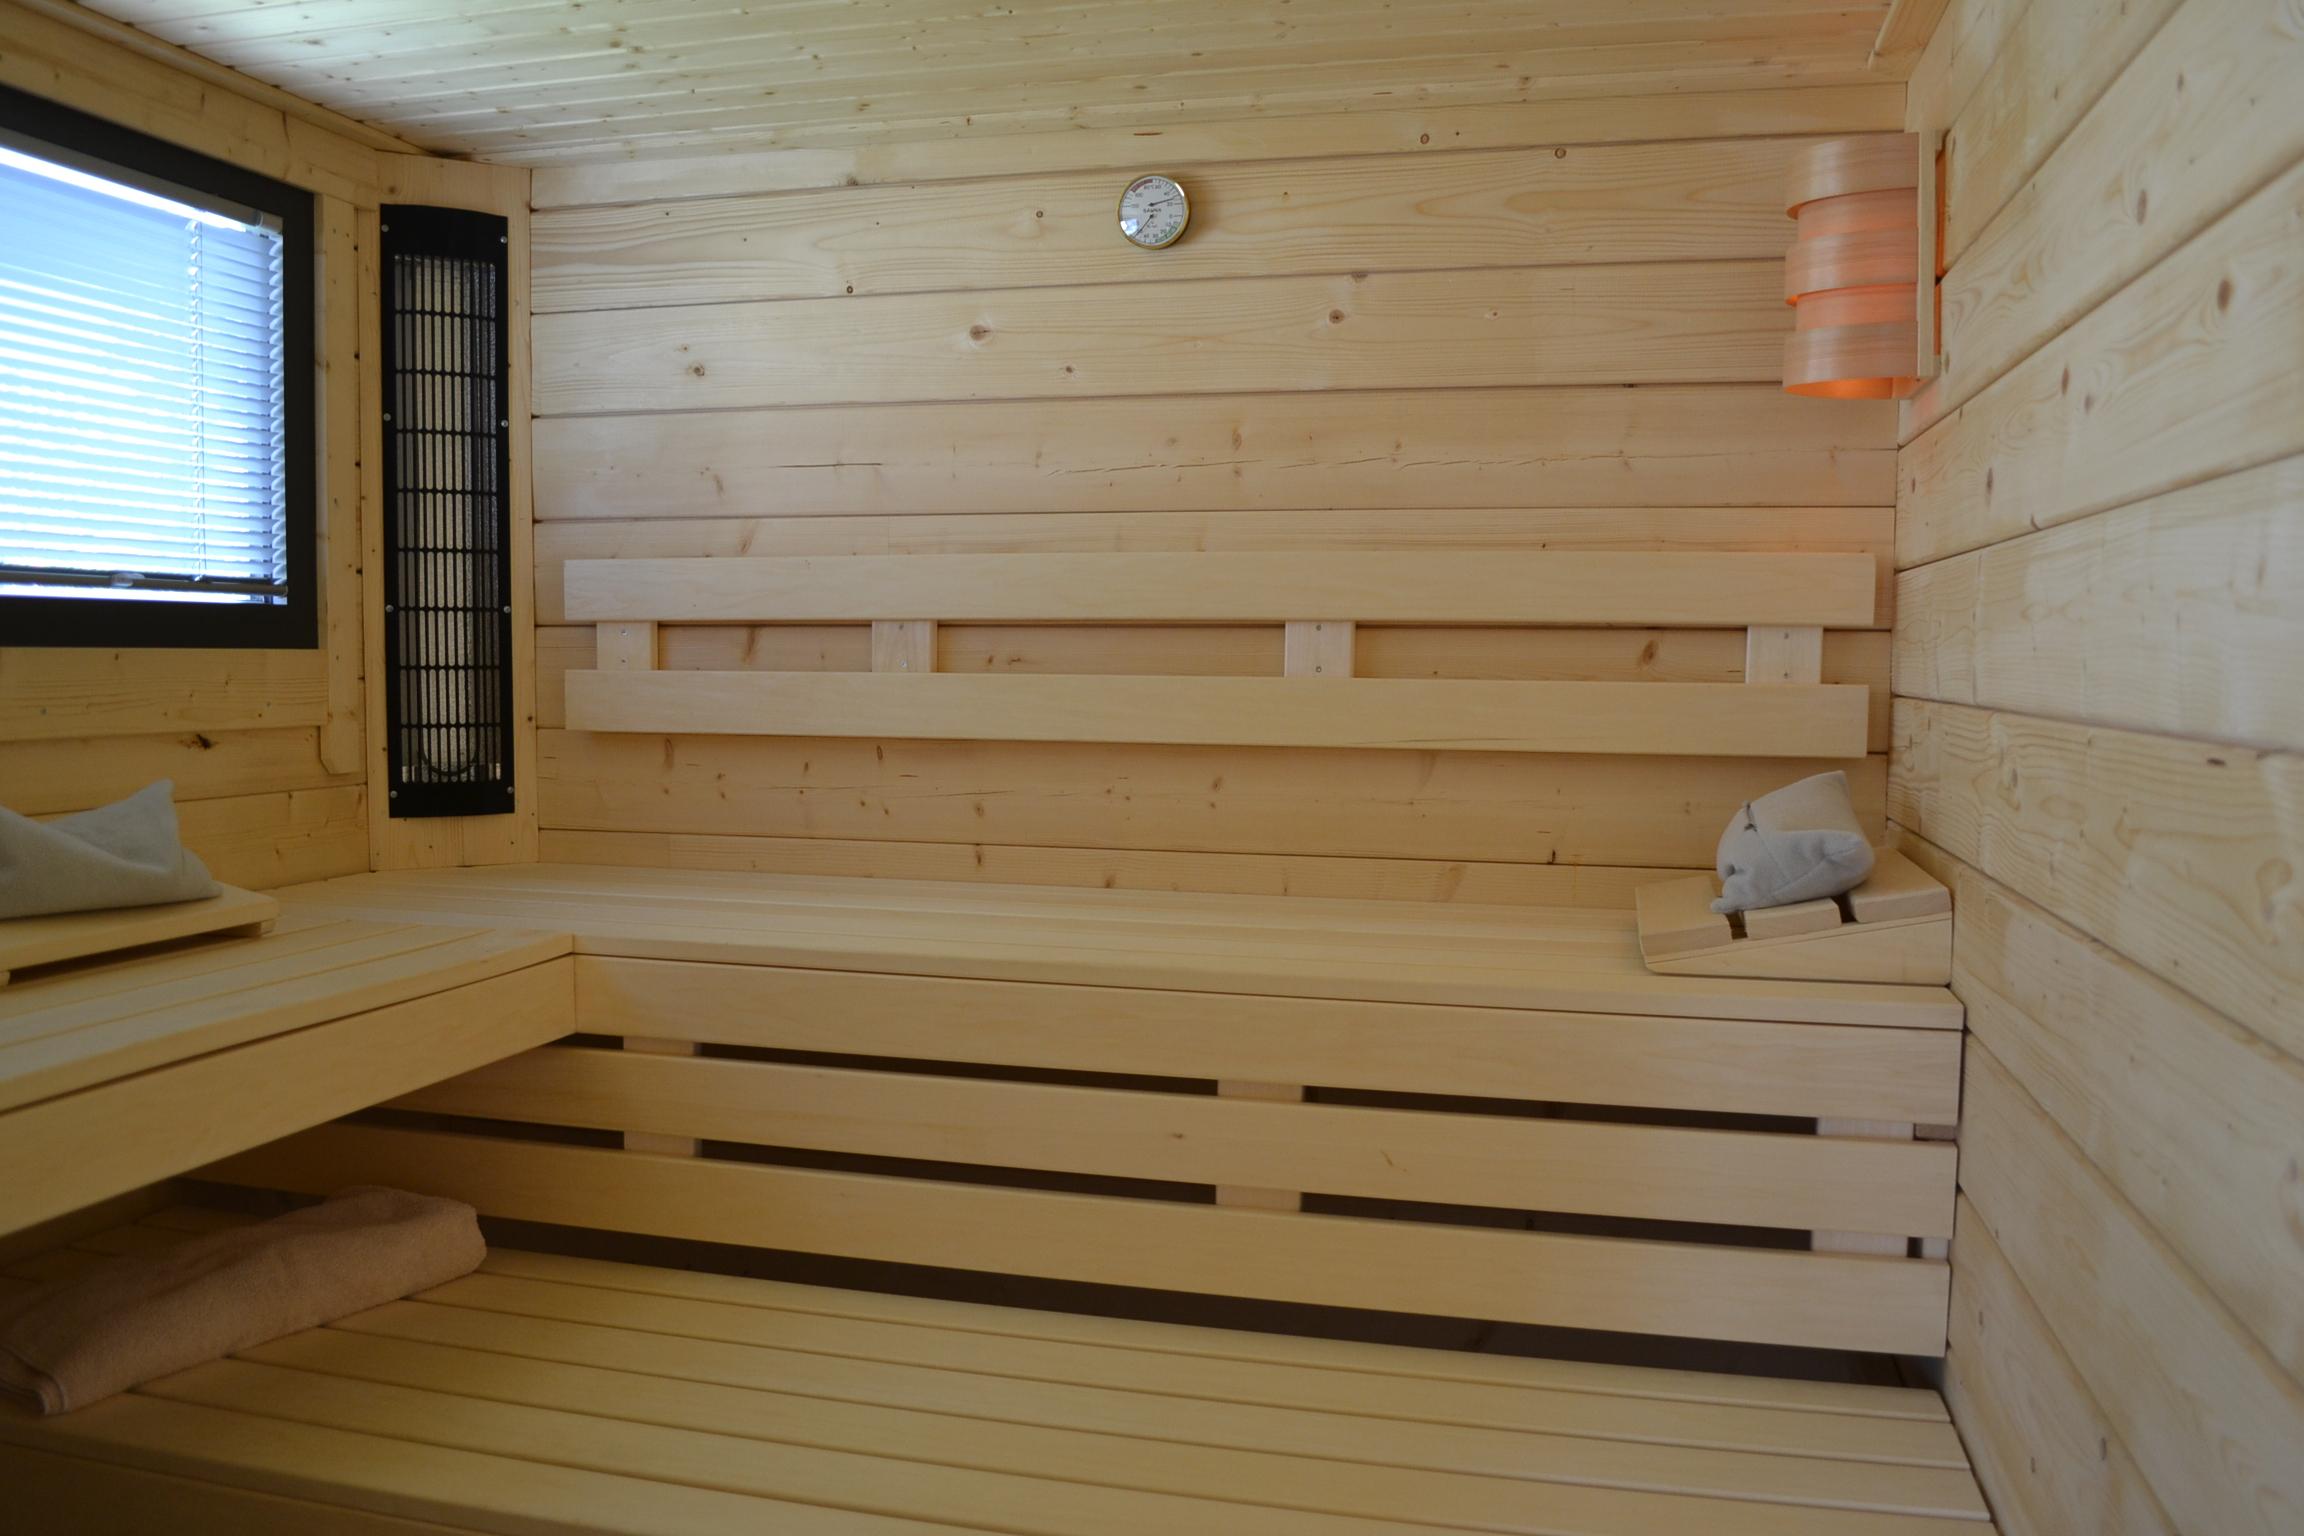 saunahaus aus 70mm blockbohlen als flachdach in g tersloh pollmeier holzbau gmbh. Black Bedroom Furniture Sets. Home Design Ideas